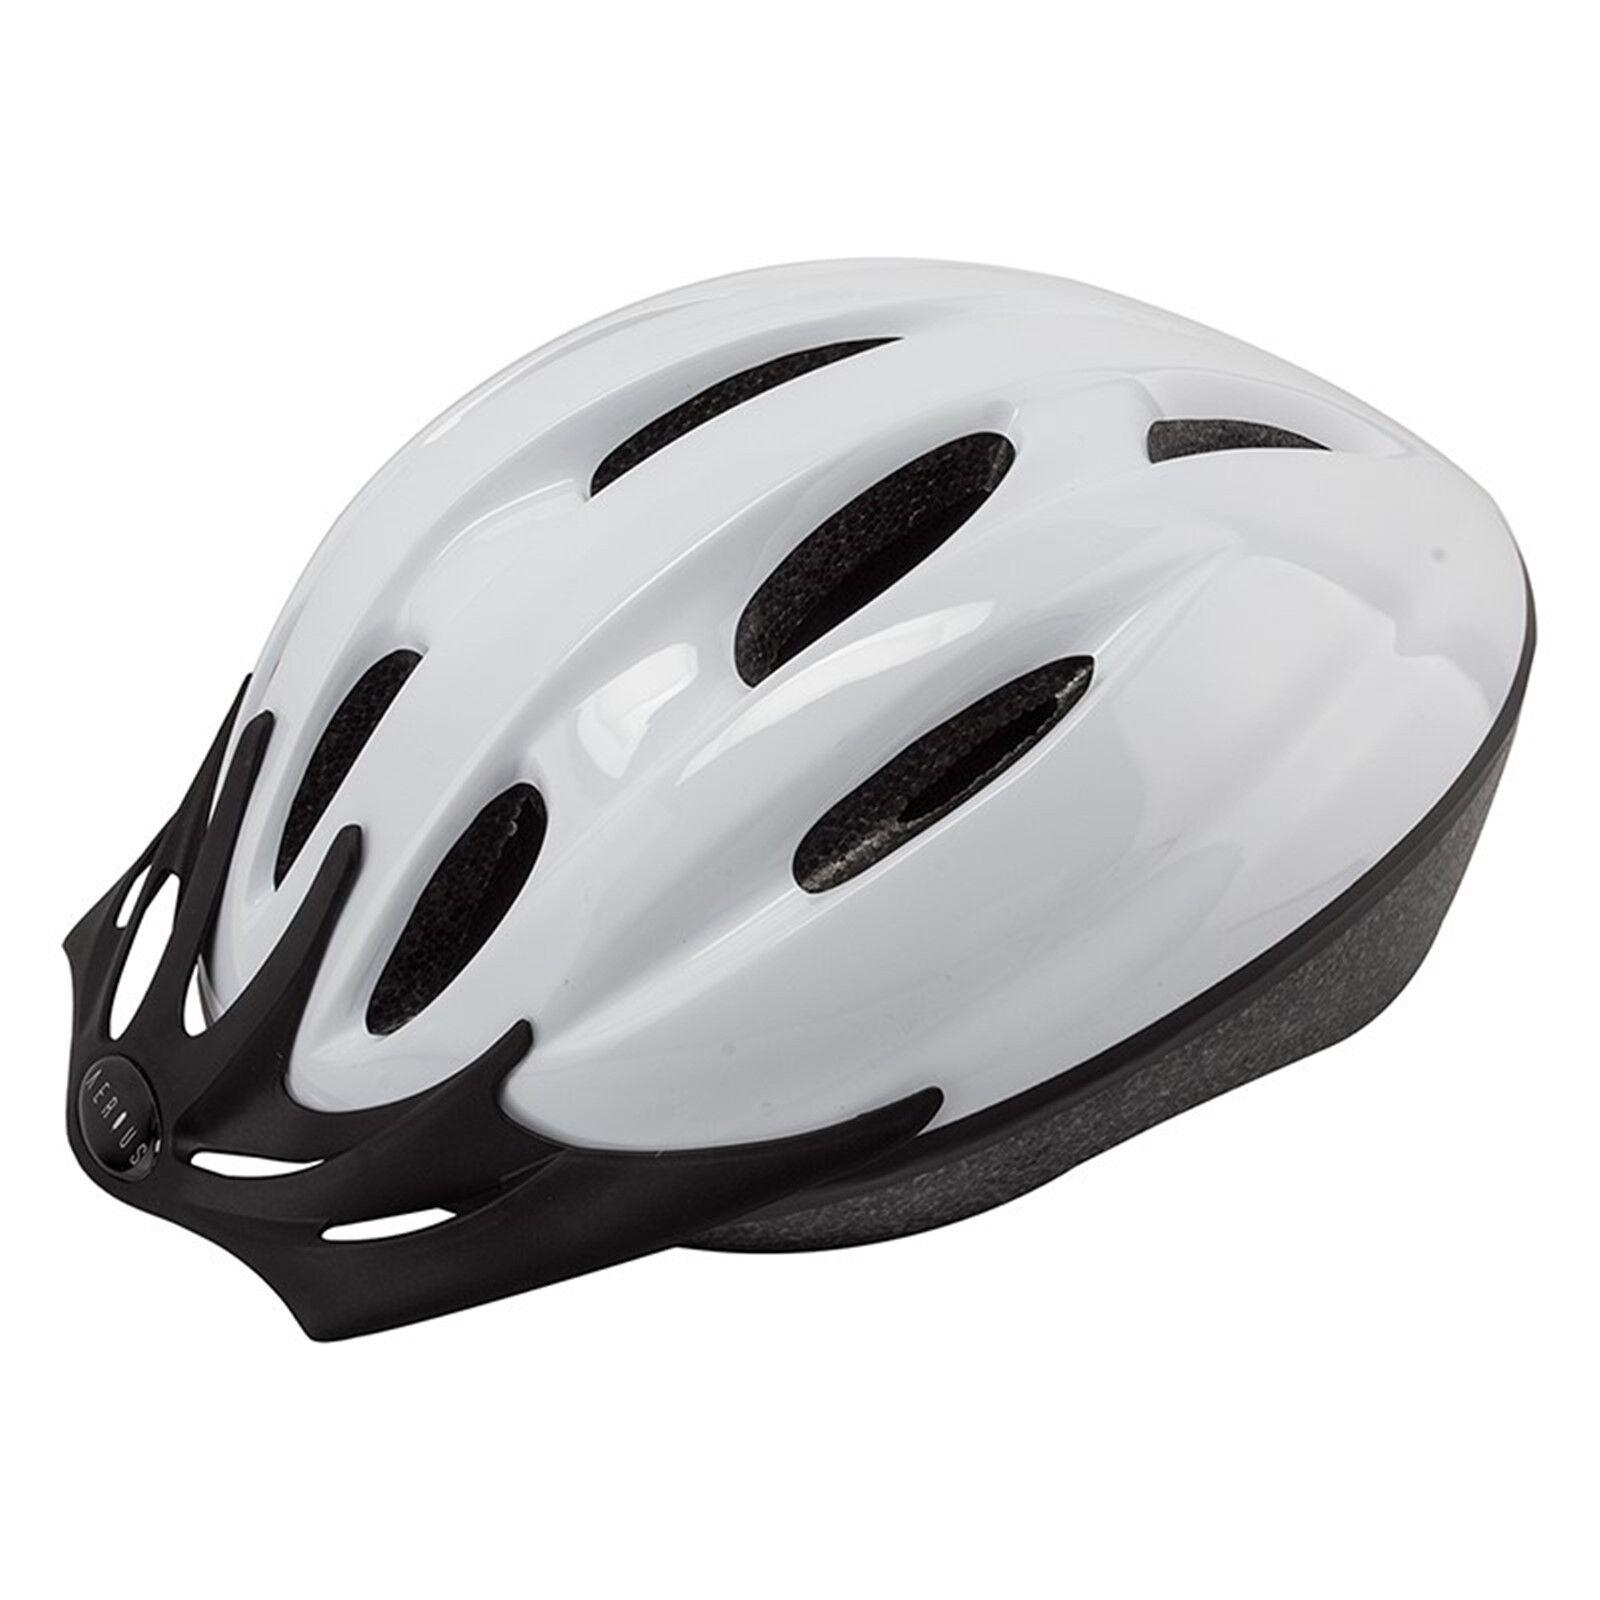 "In Mold Medium//Large Mtb 58-62Cm 22-3//4 To 24-1//2/"" Aerius V10 Helmets"